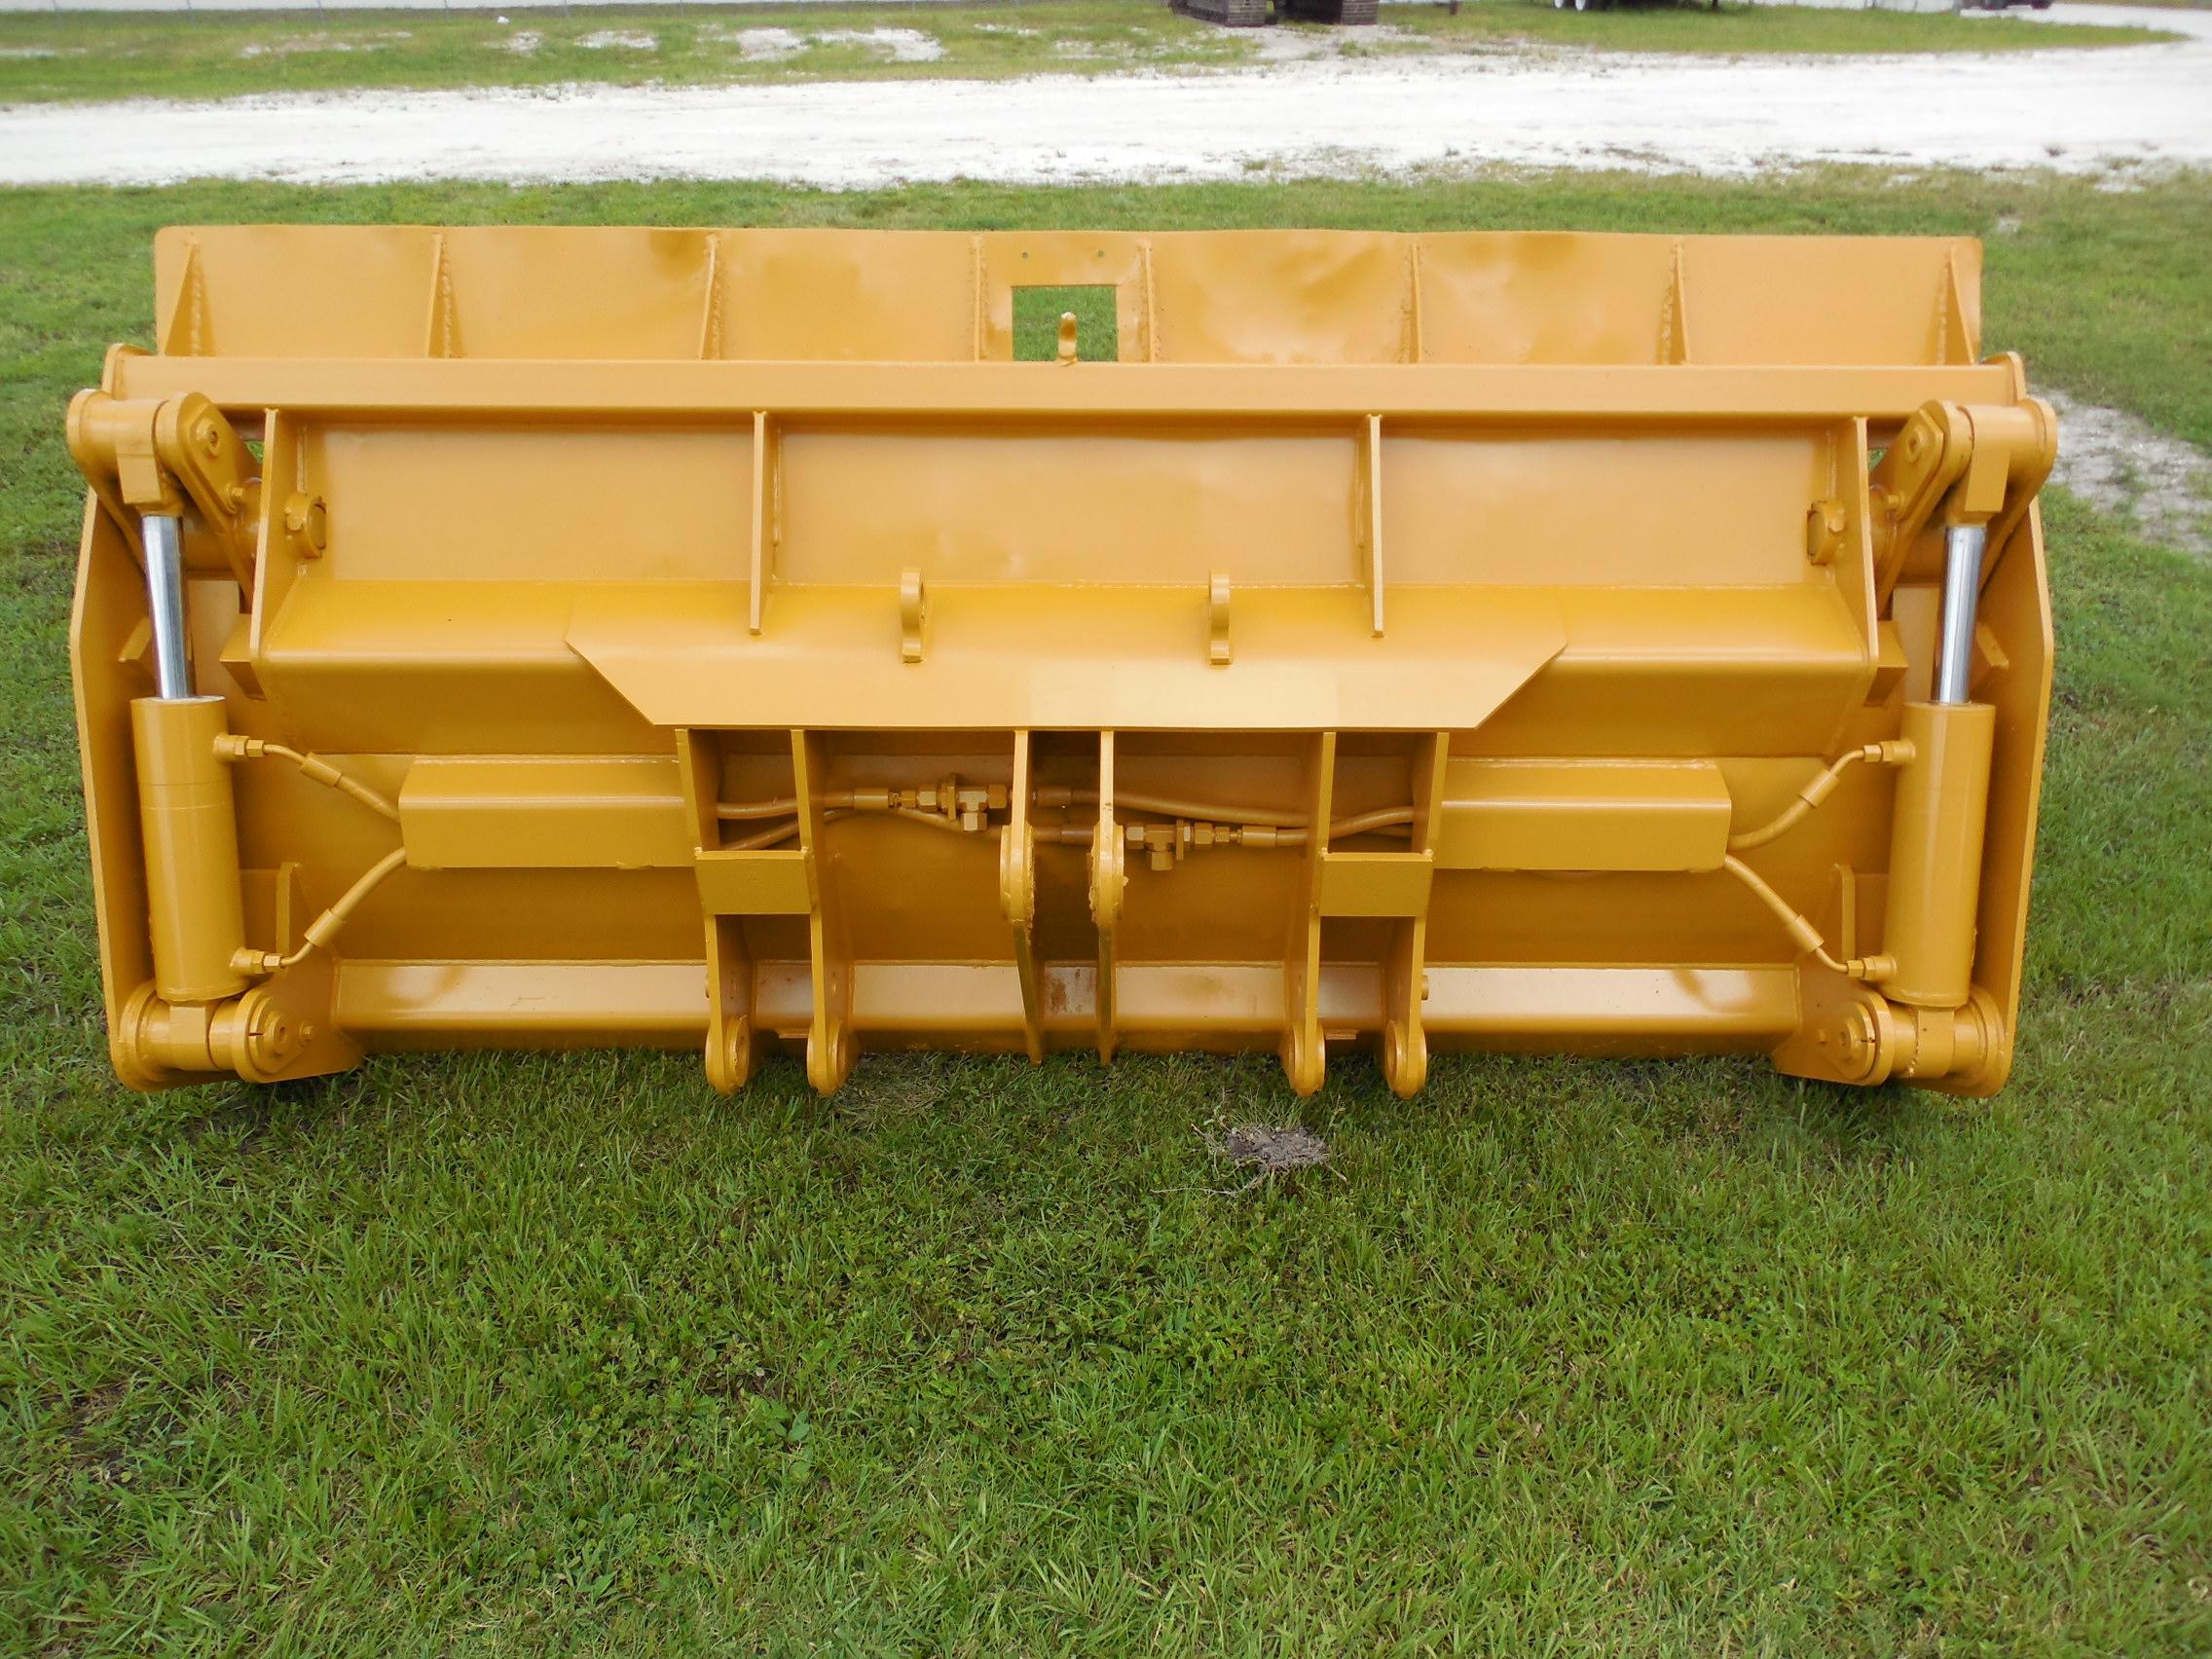 938g-h-bucket-4